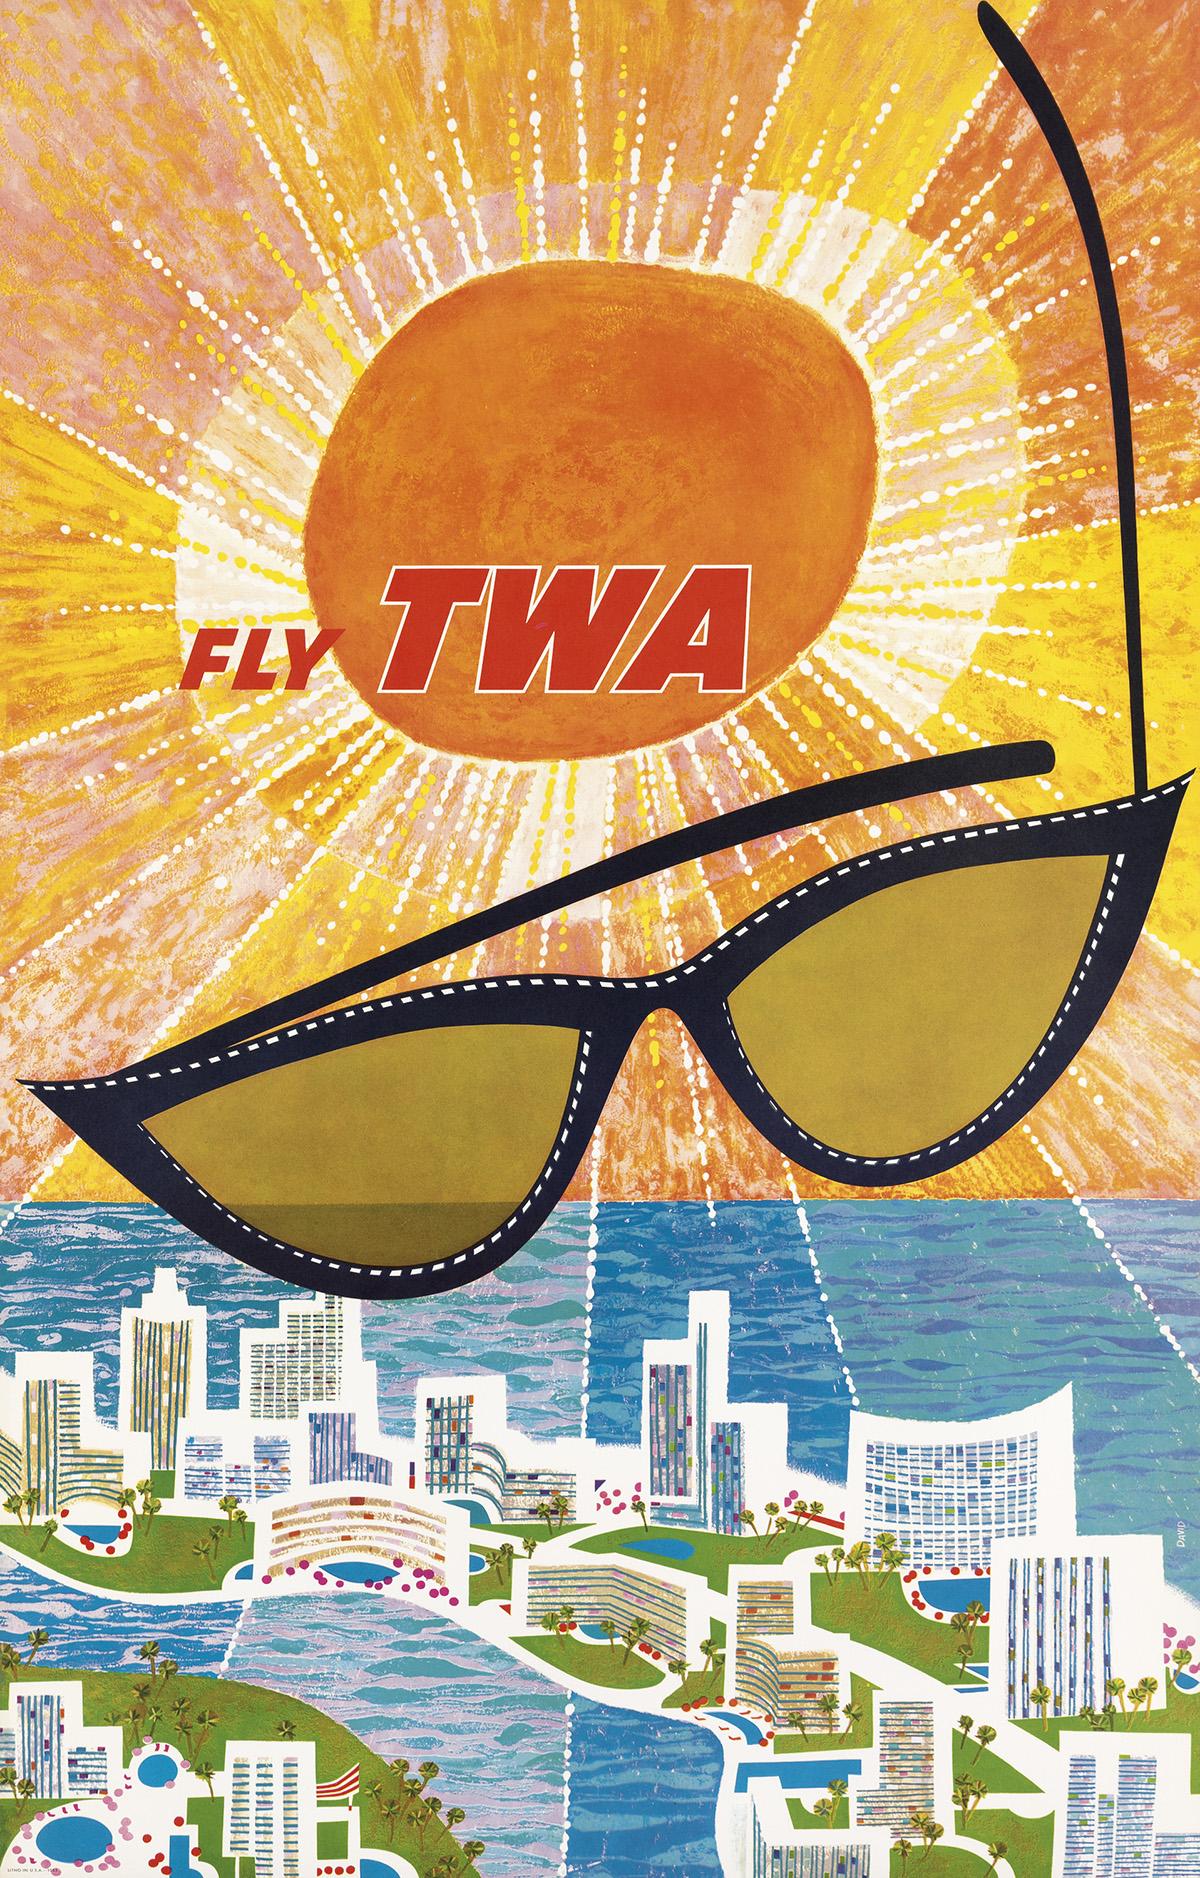 DAVID-KLEIN-(1918-2005)-FLY-TWA--[FLORIDA]-Circa-1960-39x25-